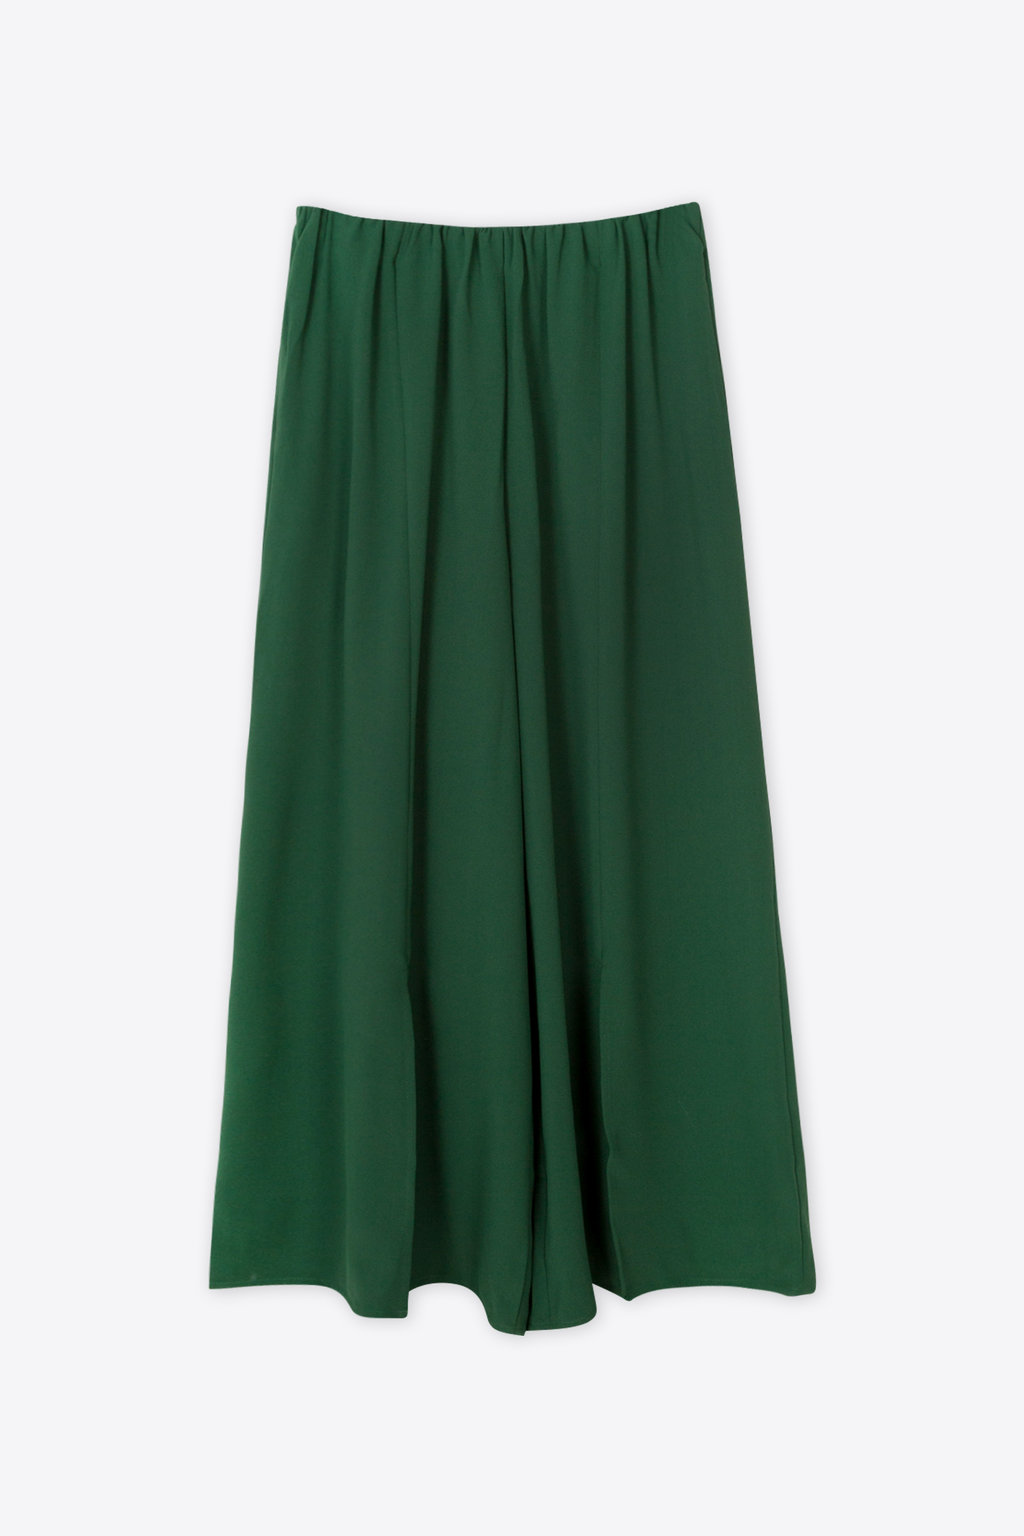 New Pant 1392 Green 7